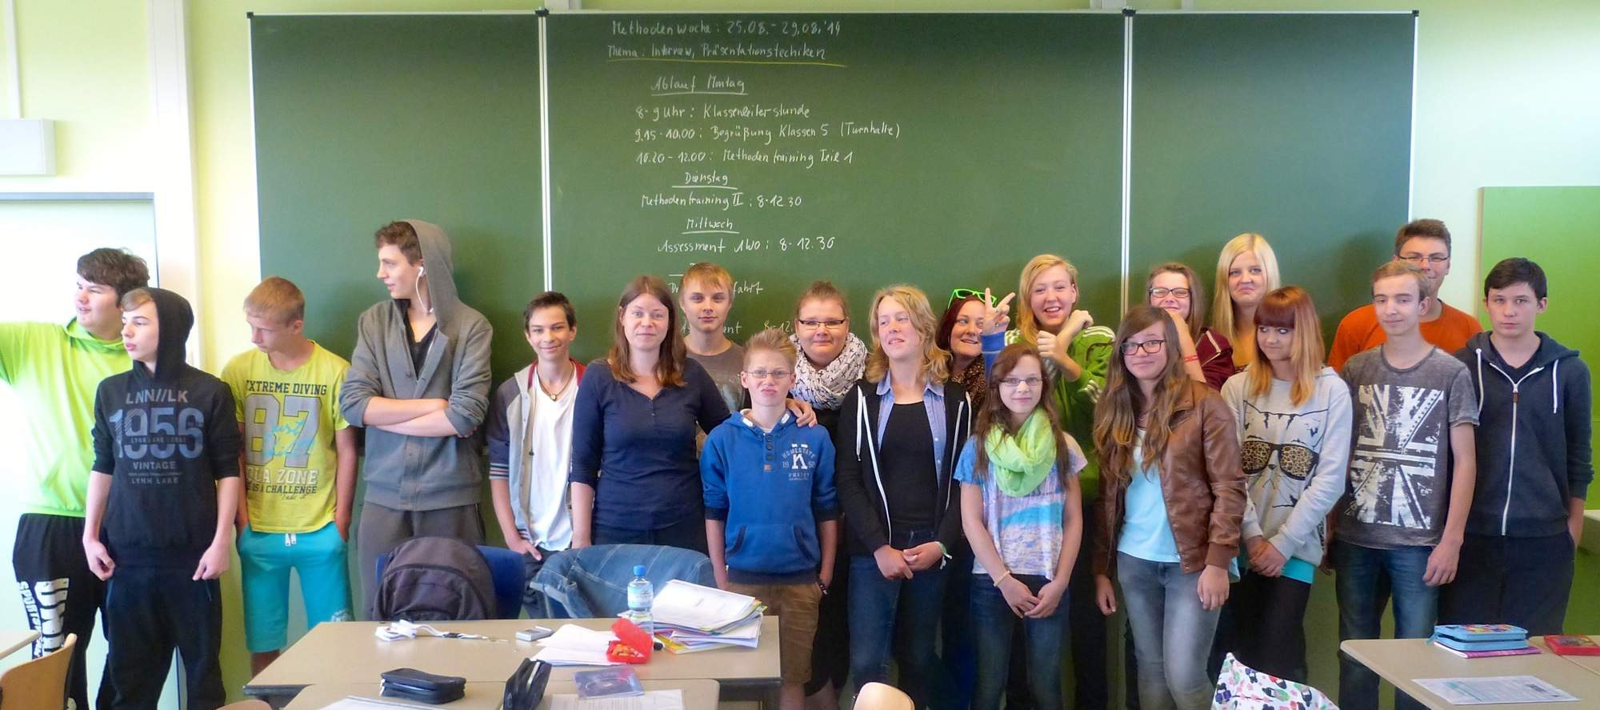 klasse-8b-2014ulk